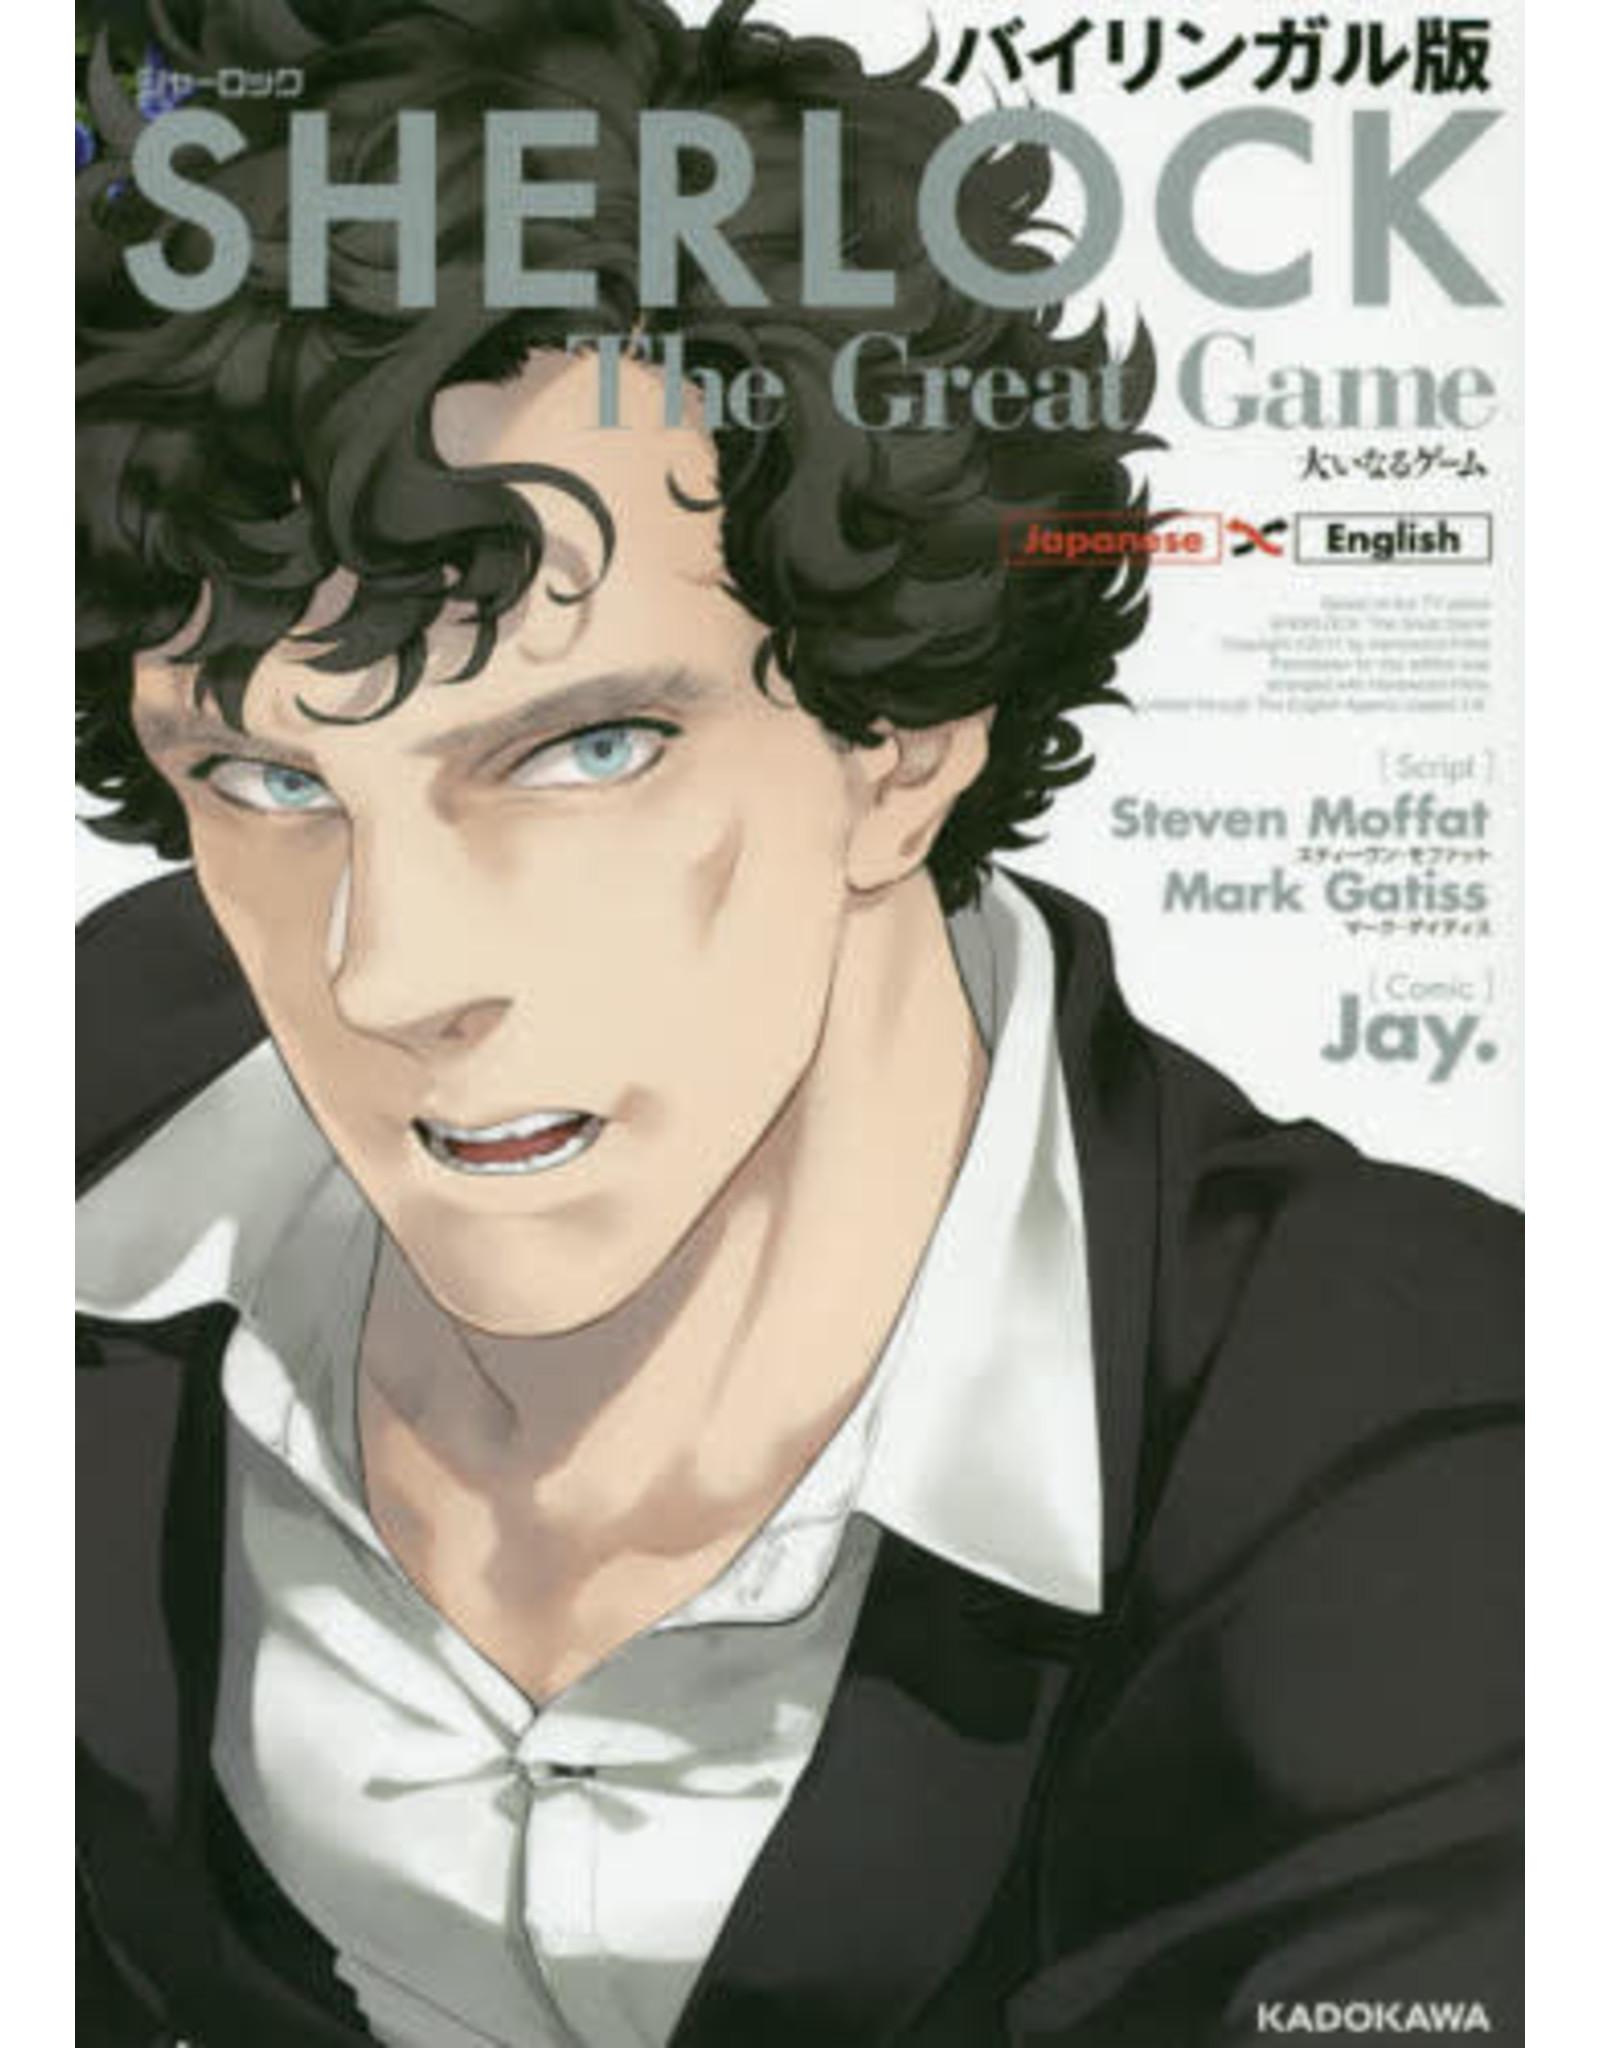 [BILINGUAL] SHERLOCK THE GREAT GAME